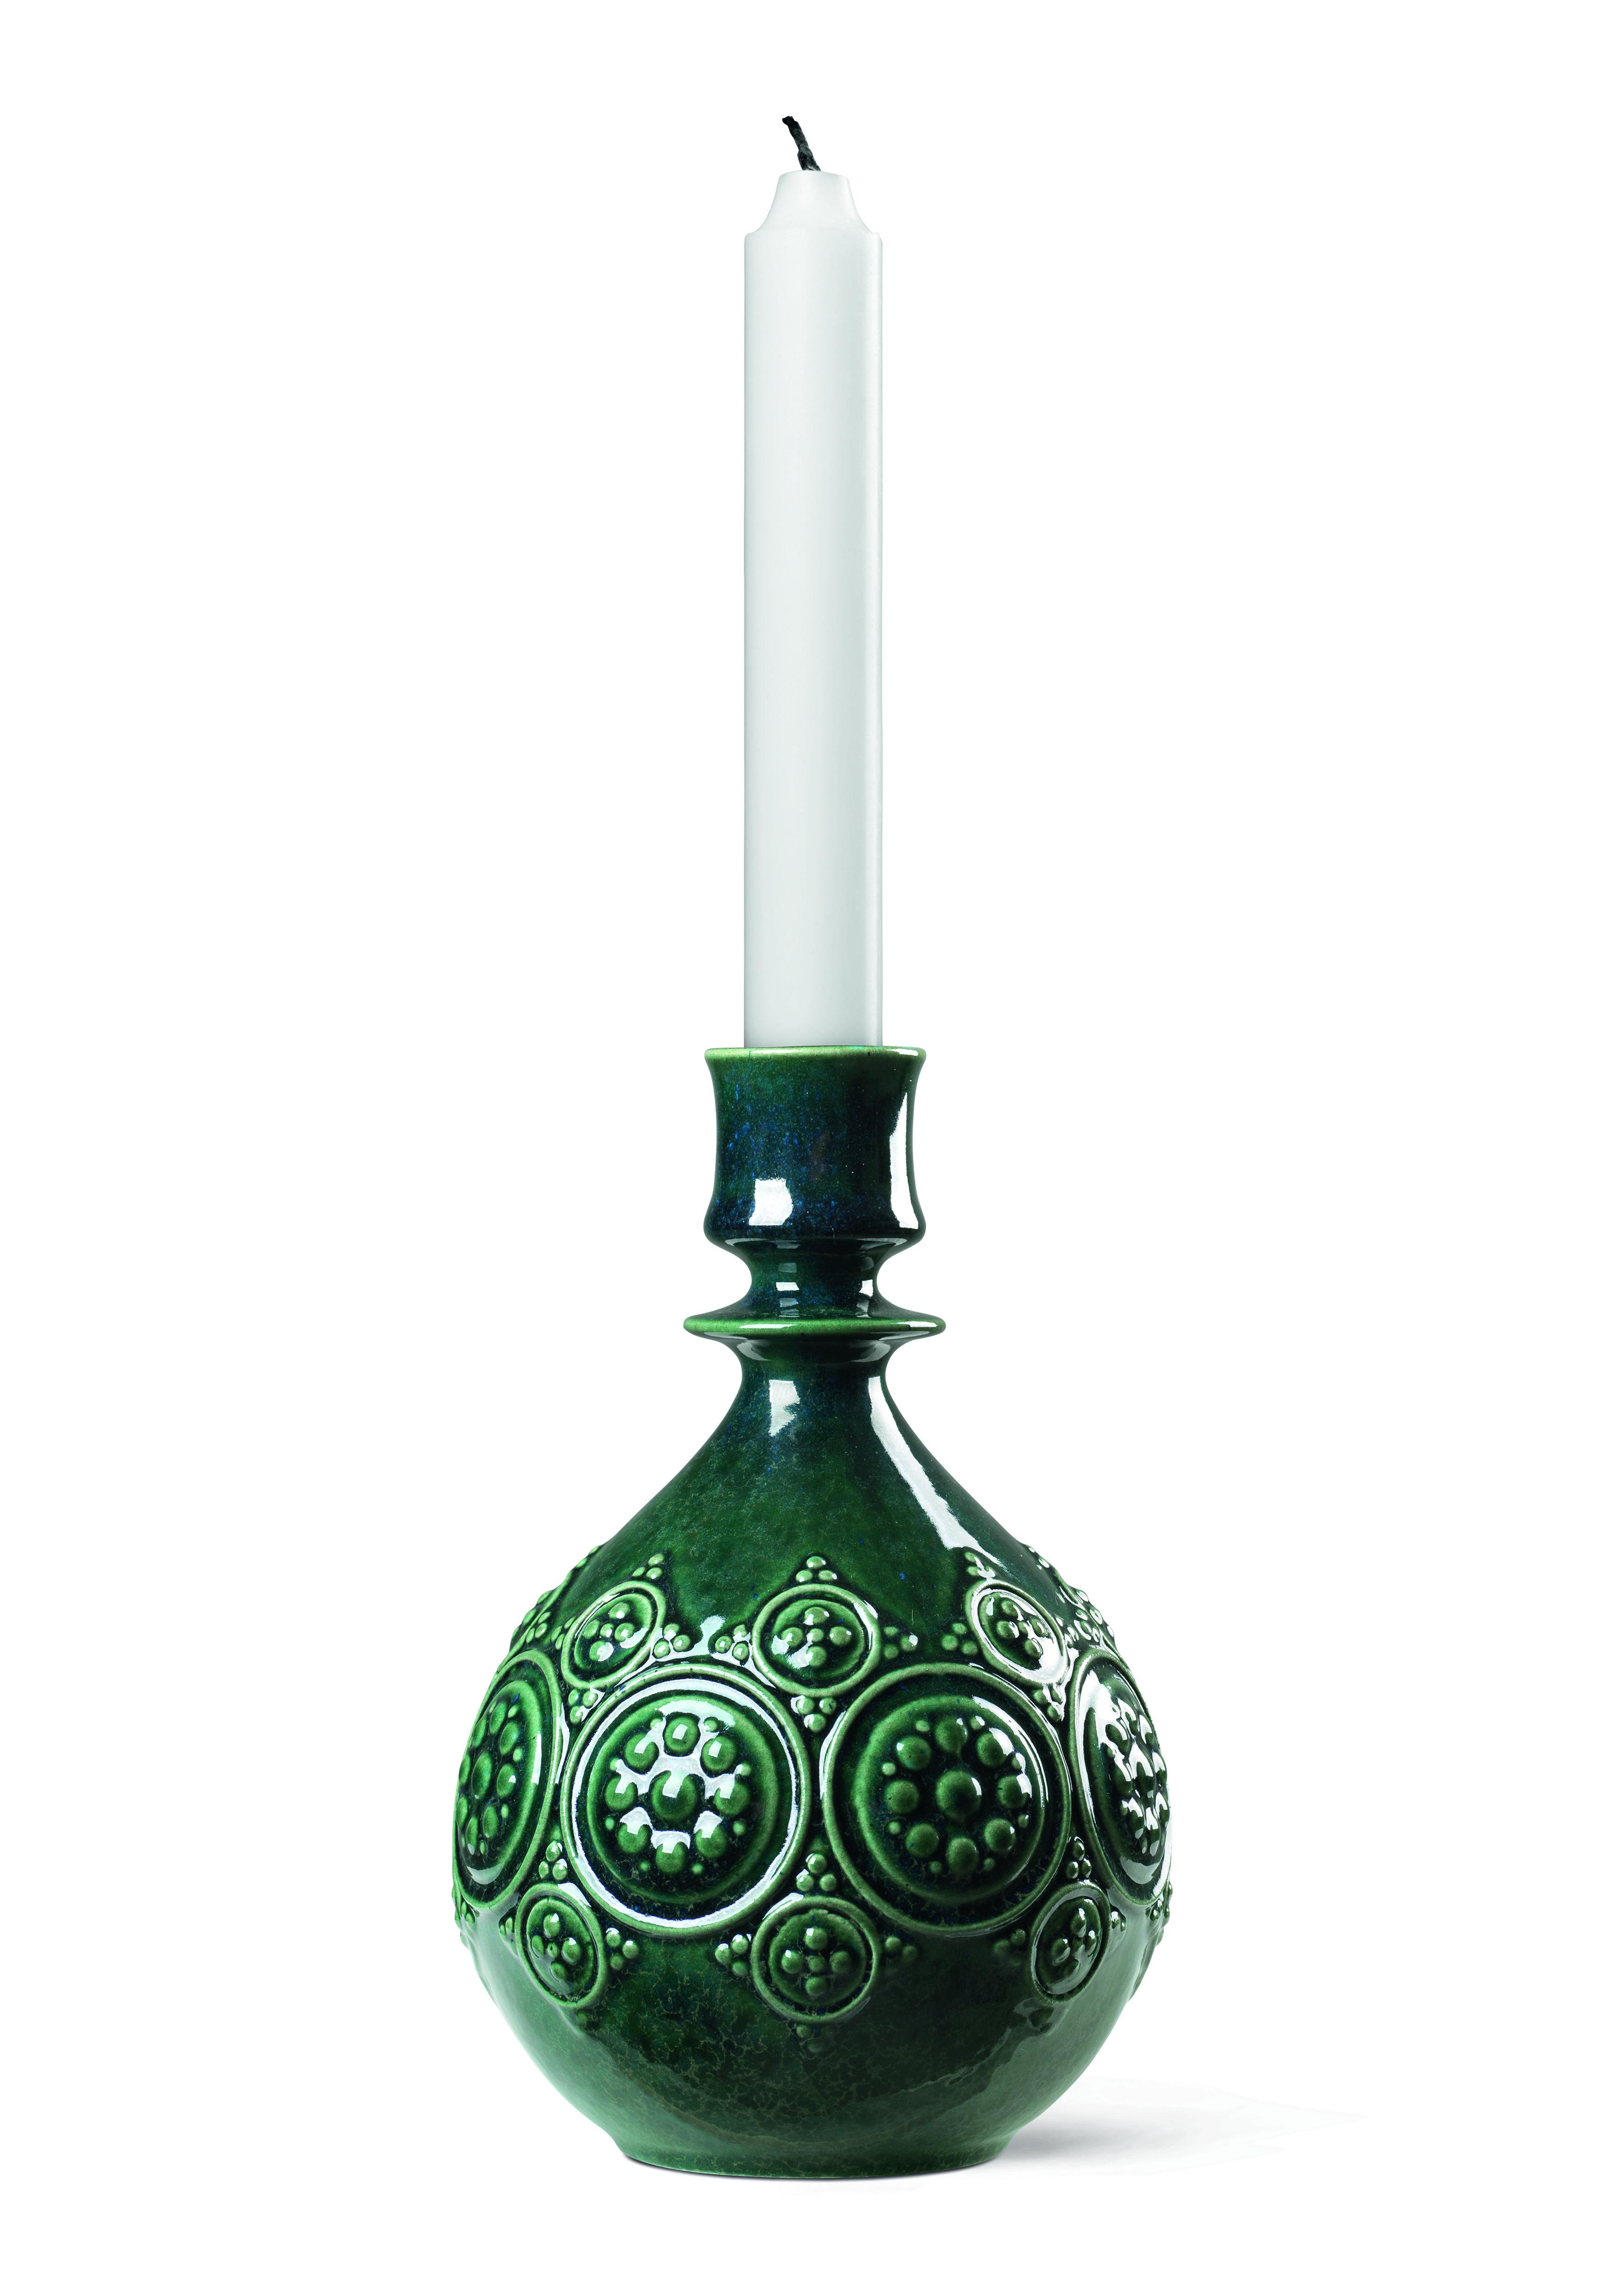 Björn Wiinblad Symphony Magic lysestage, 18 cm, mørk grøn